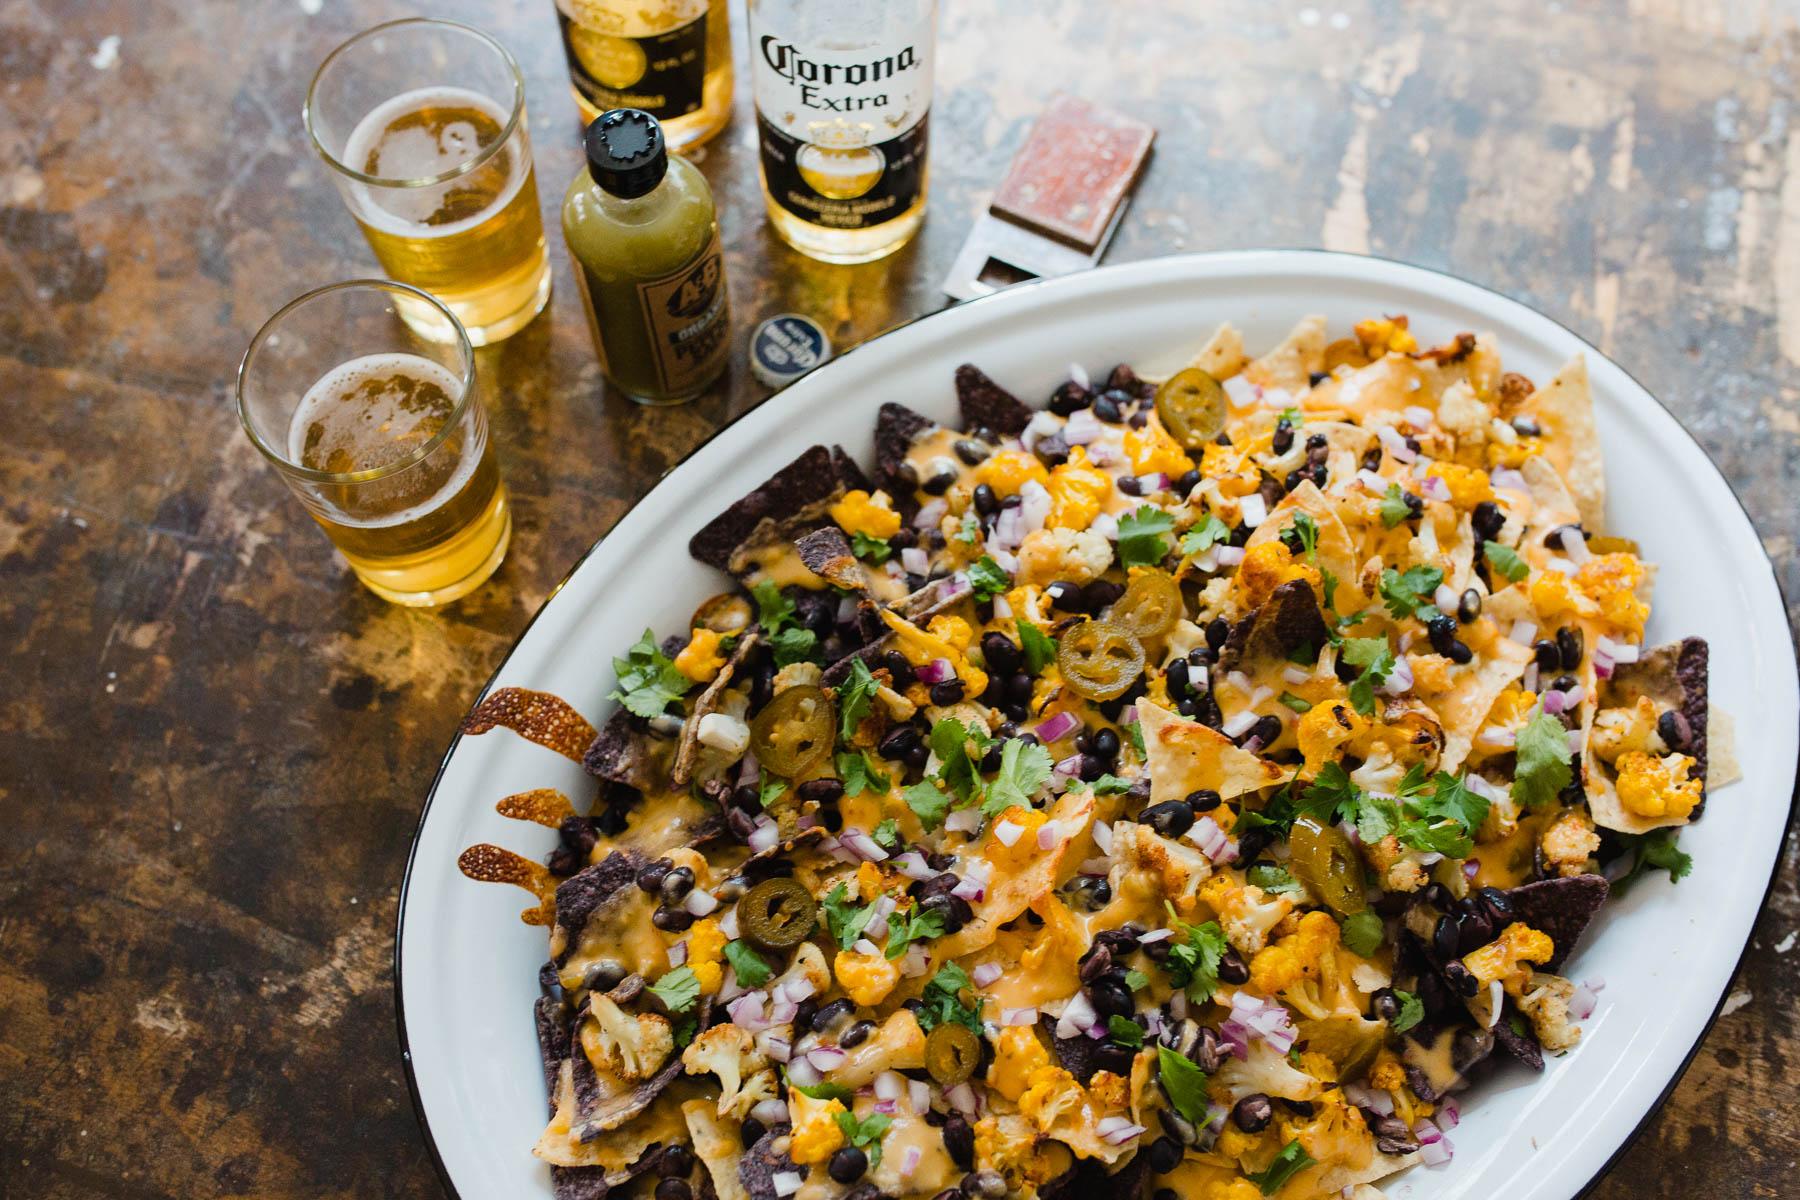 chicago-nyc-food-lifestyle-photographer-20.jpg